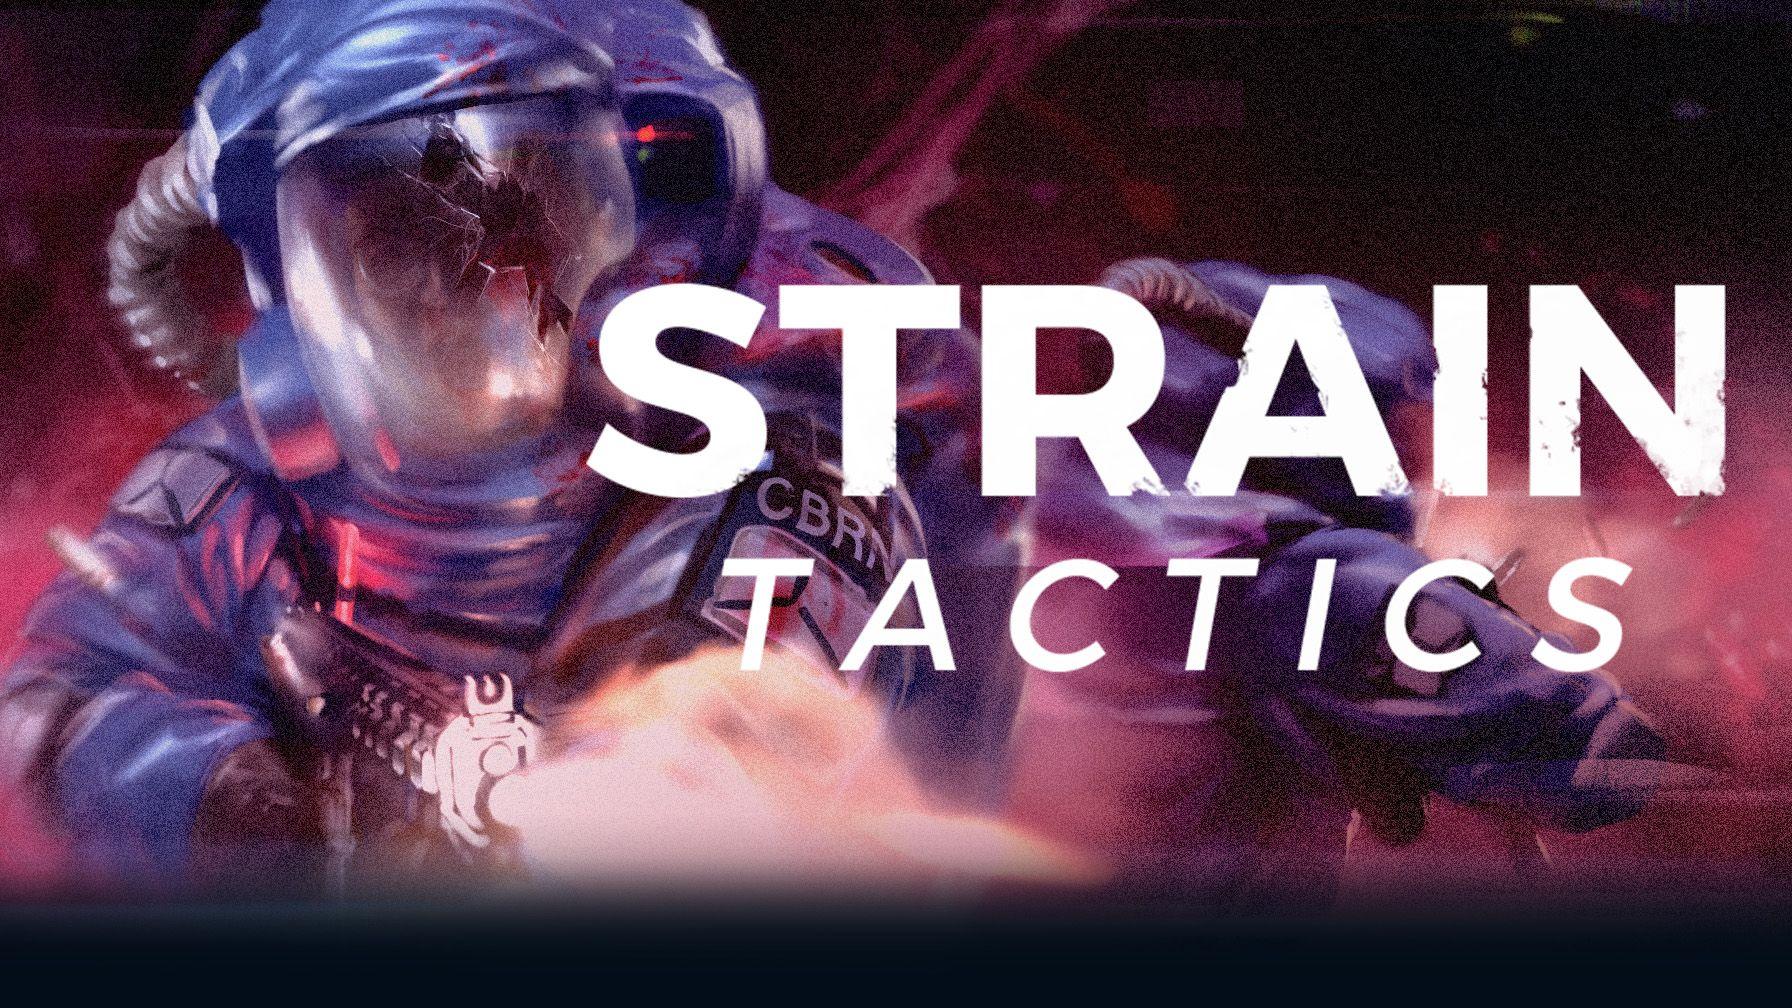 Strain Tactics Full Game Unlock Mod Apk For Android Full